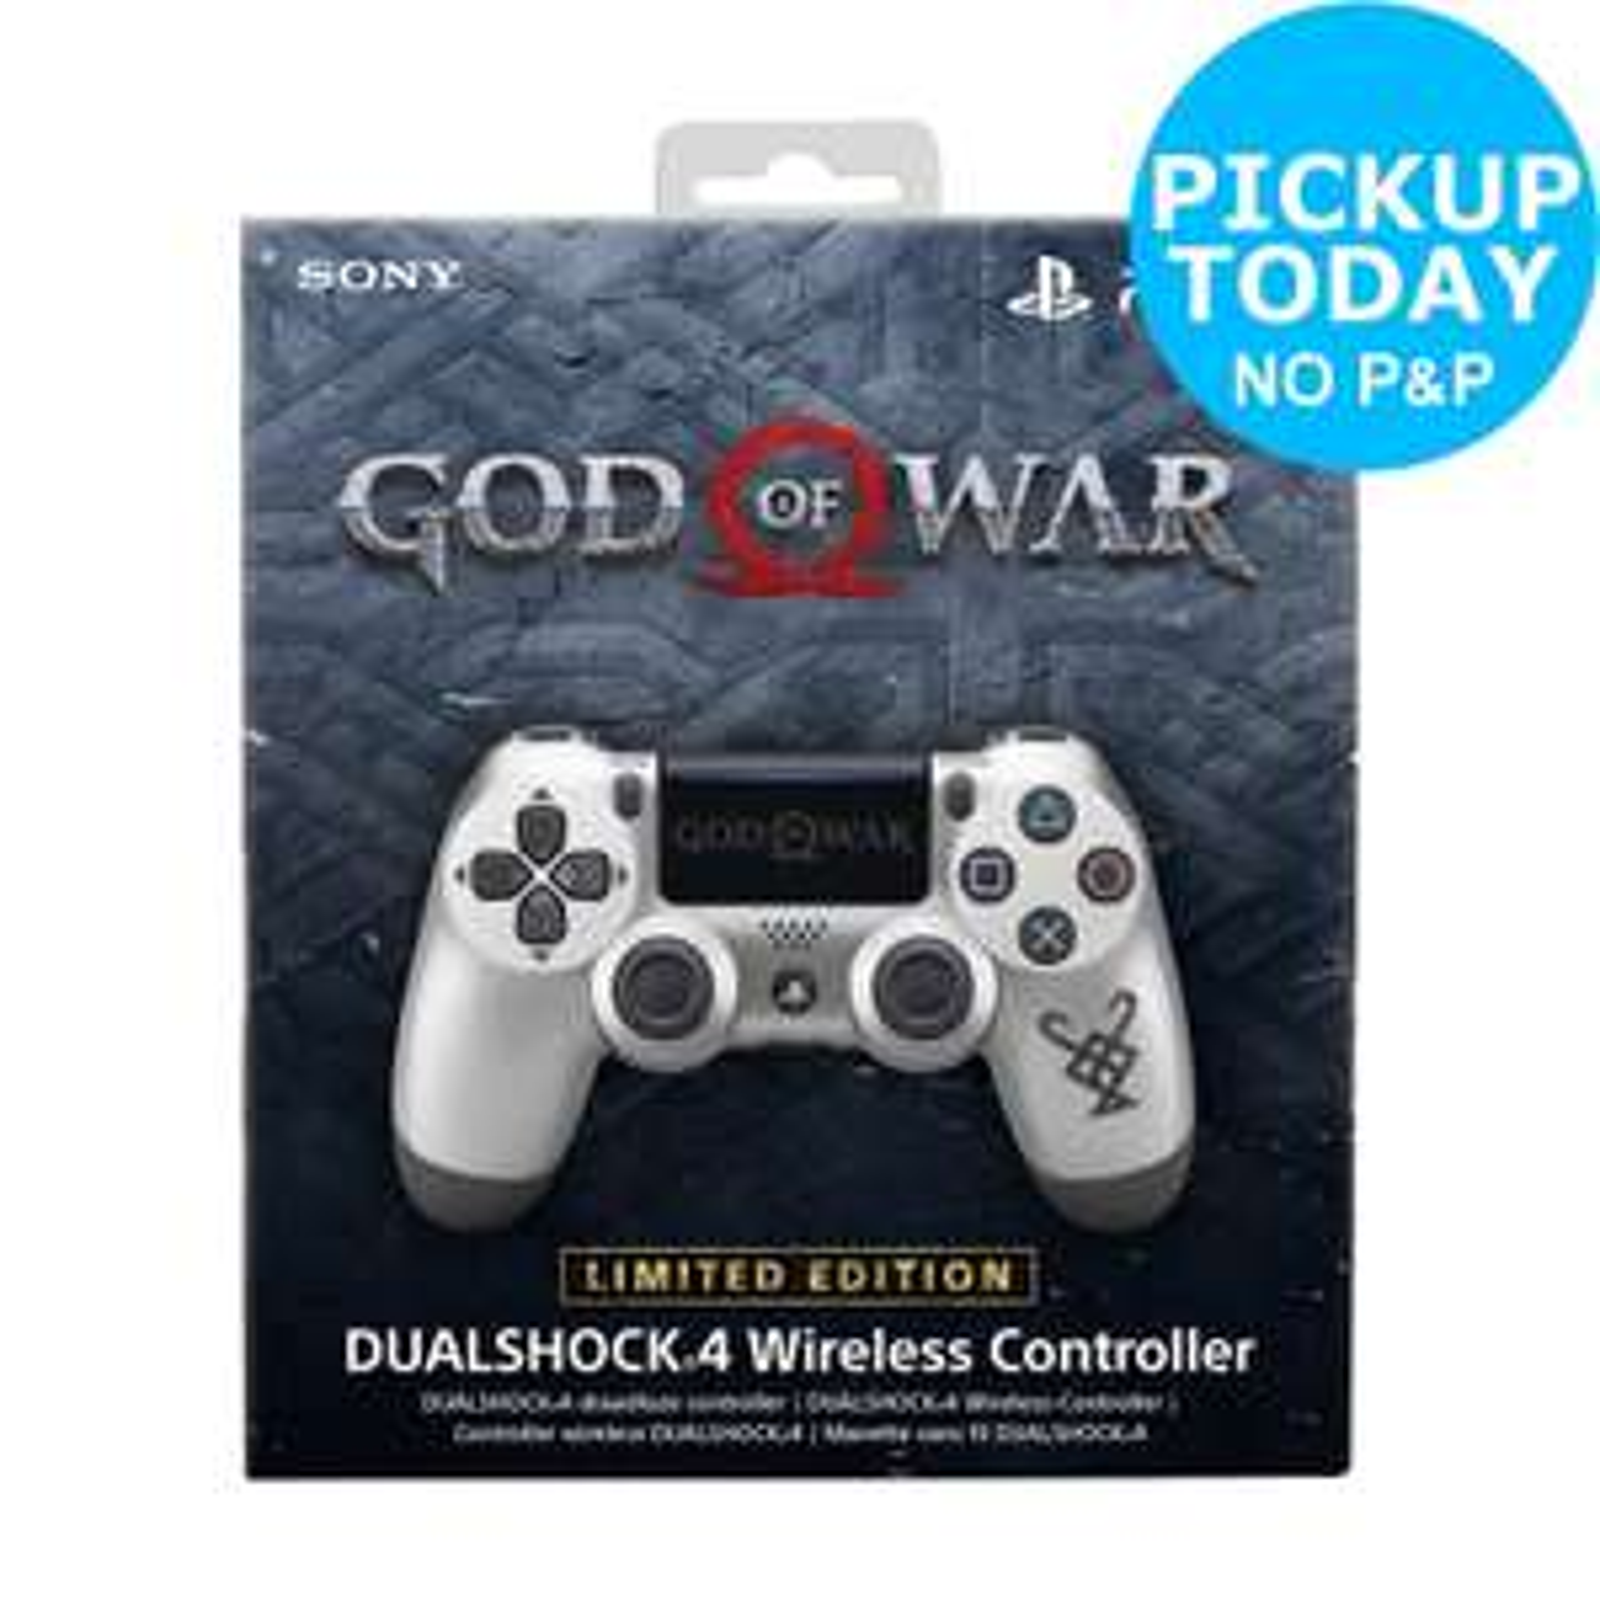 Limited Edition God of War PS4 Dualshock 4 Controller - £35.99 - eBay/Argos (Argos)